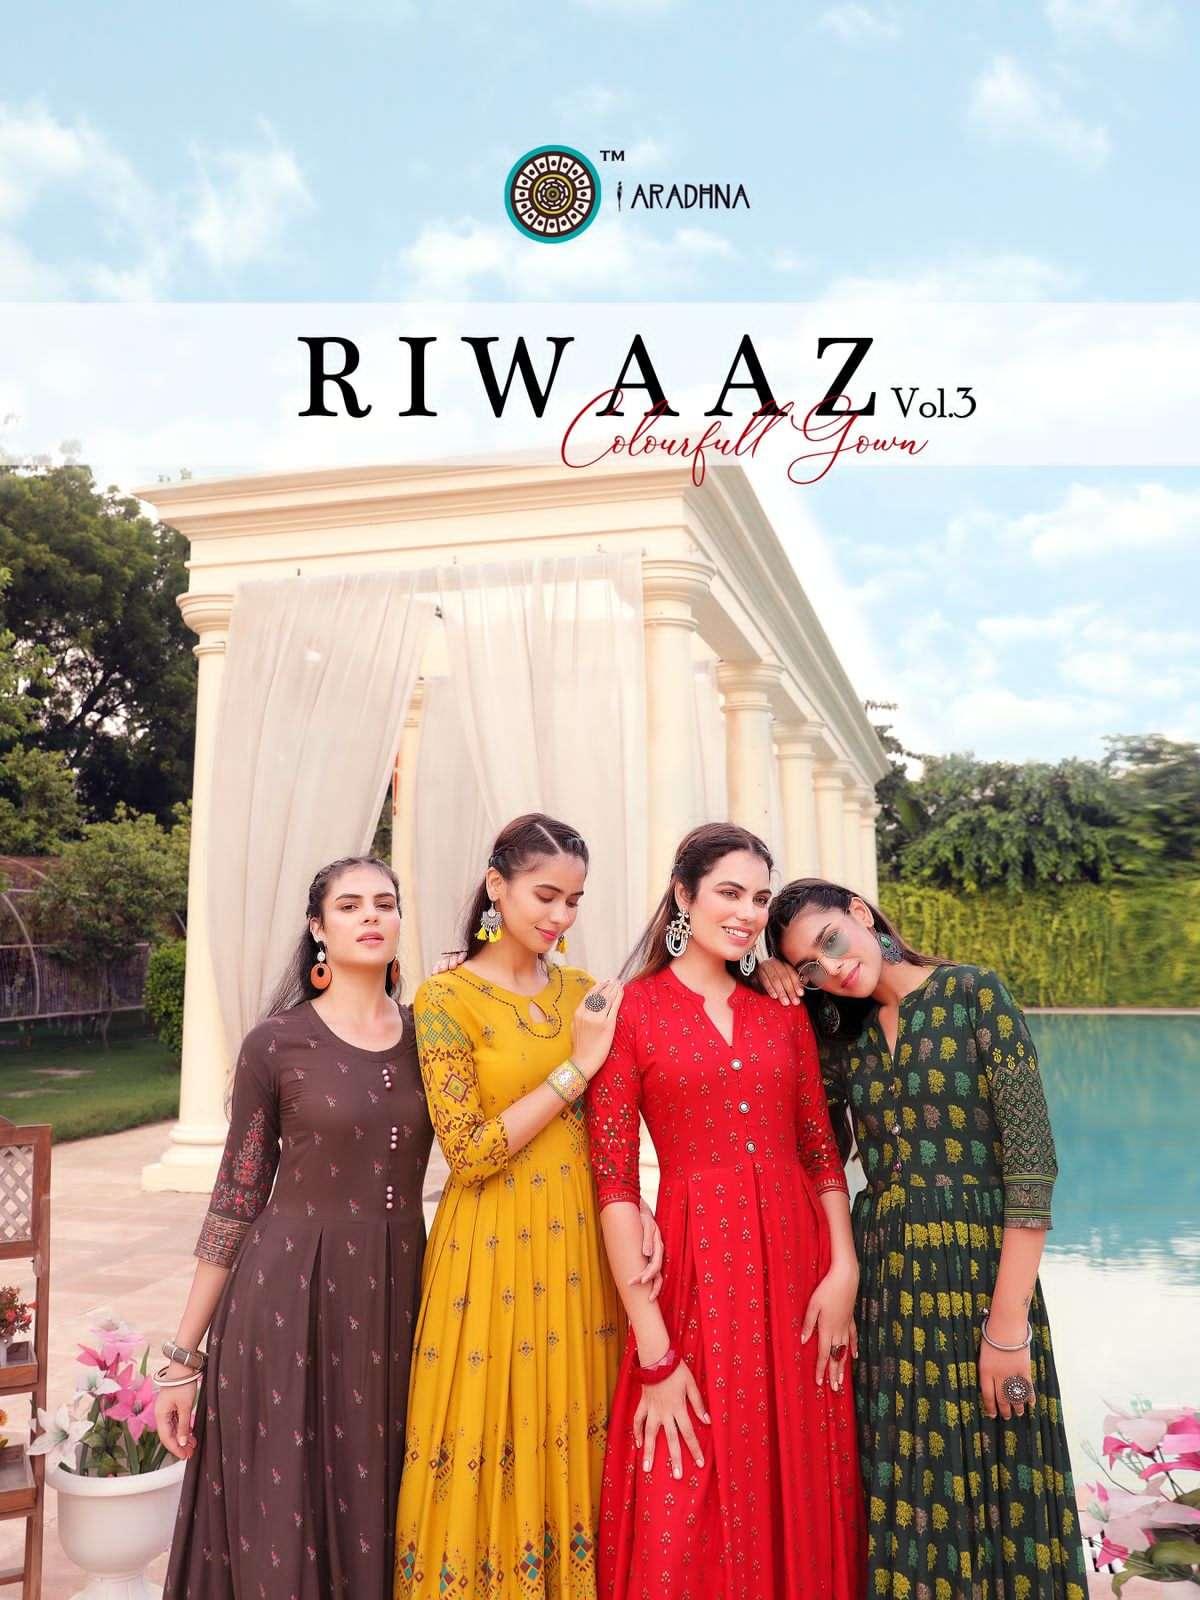 Aradhna Fashion Riwaaz Vol 3 heavy Rayon Long Anarkali Kurtis collection